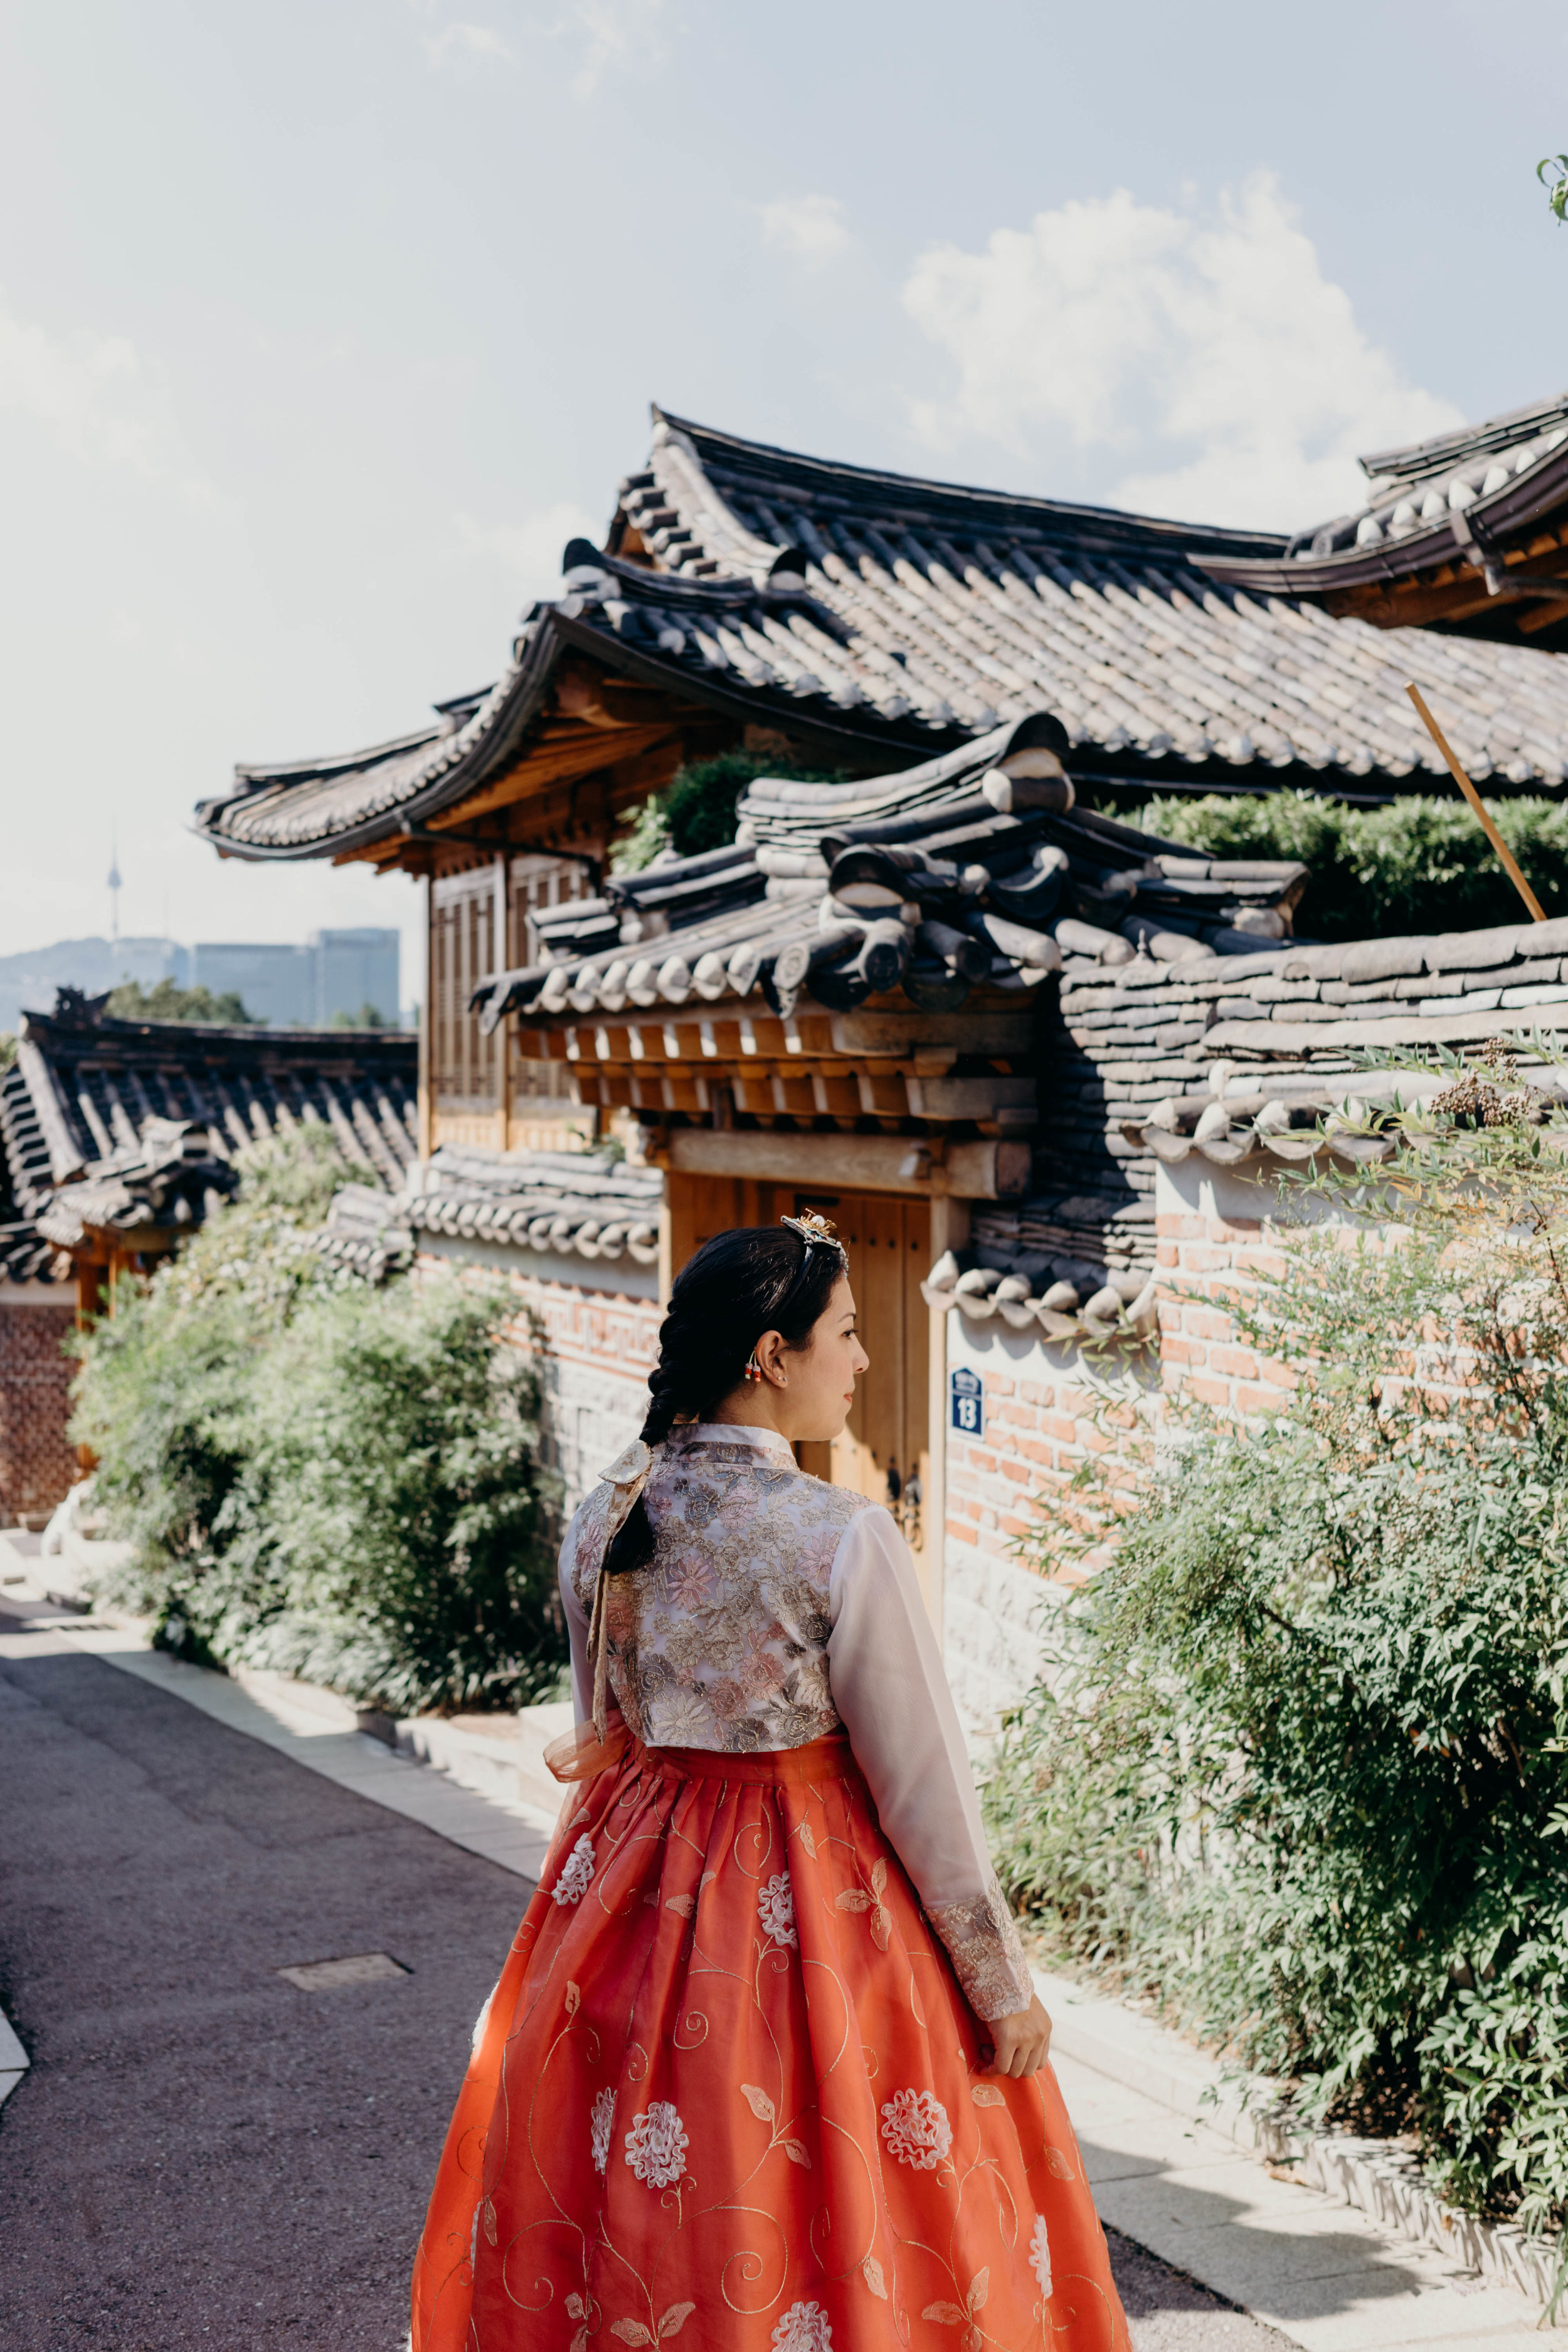 How to Plan Five Days in Seoul | On the Street Where We Live ( aretherelilactrees.com )  hanbok, Bukchon Hanok Village, Seoul, South Korea